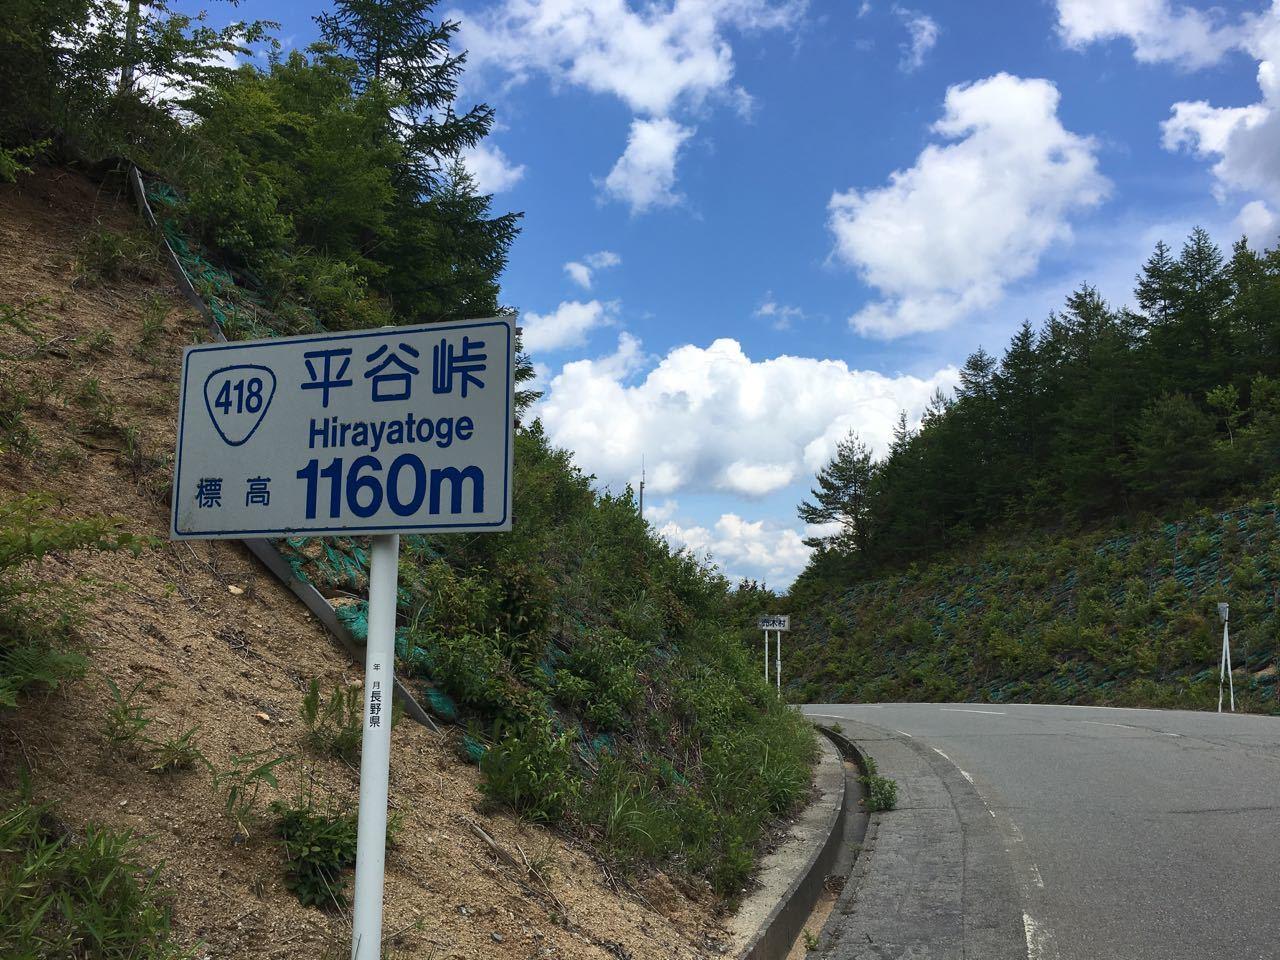 2019.06.25「200km、4,000up」_c0197974_04351600.jpg